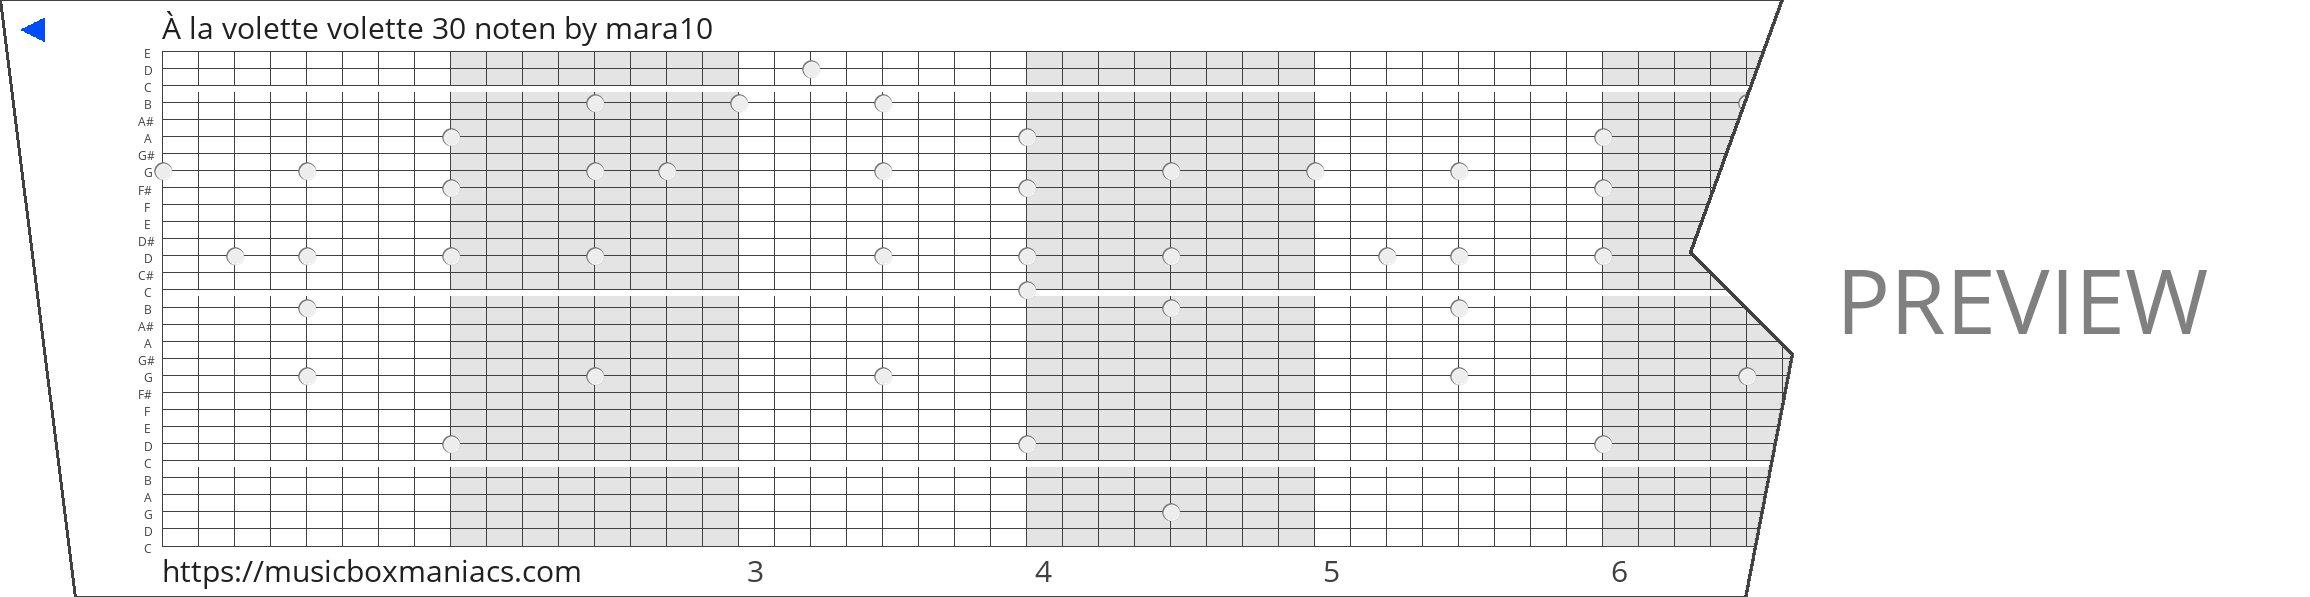 À la volette volette 30 noten 30 note music box paper strip